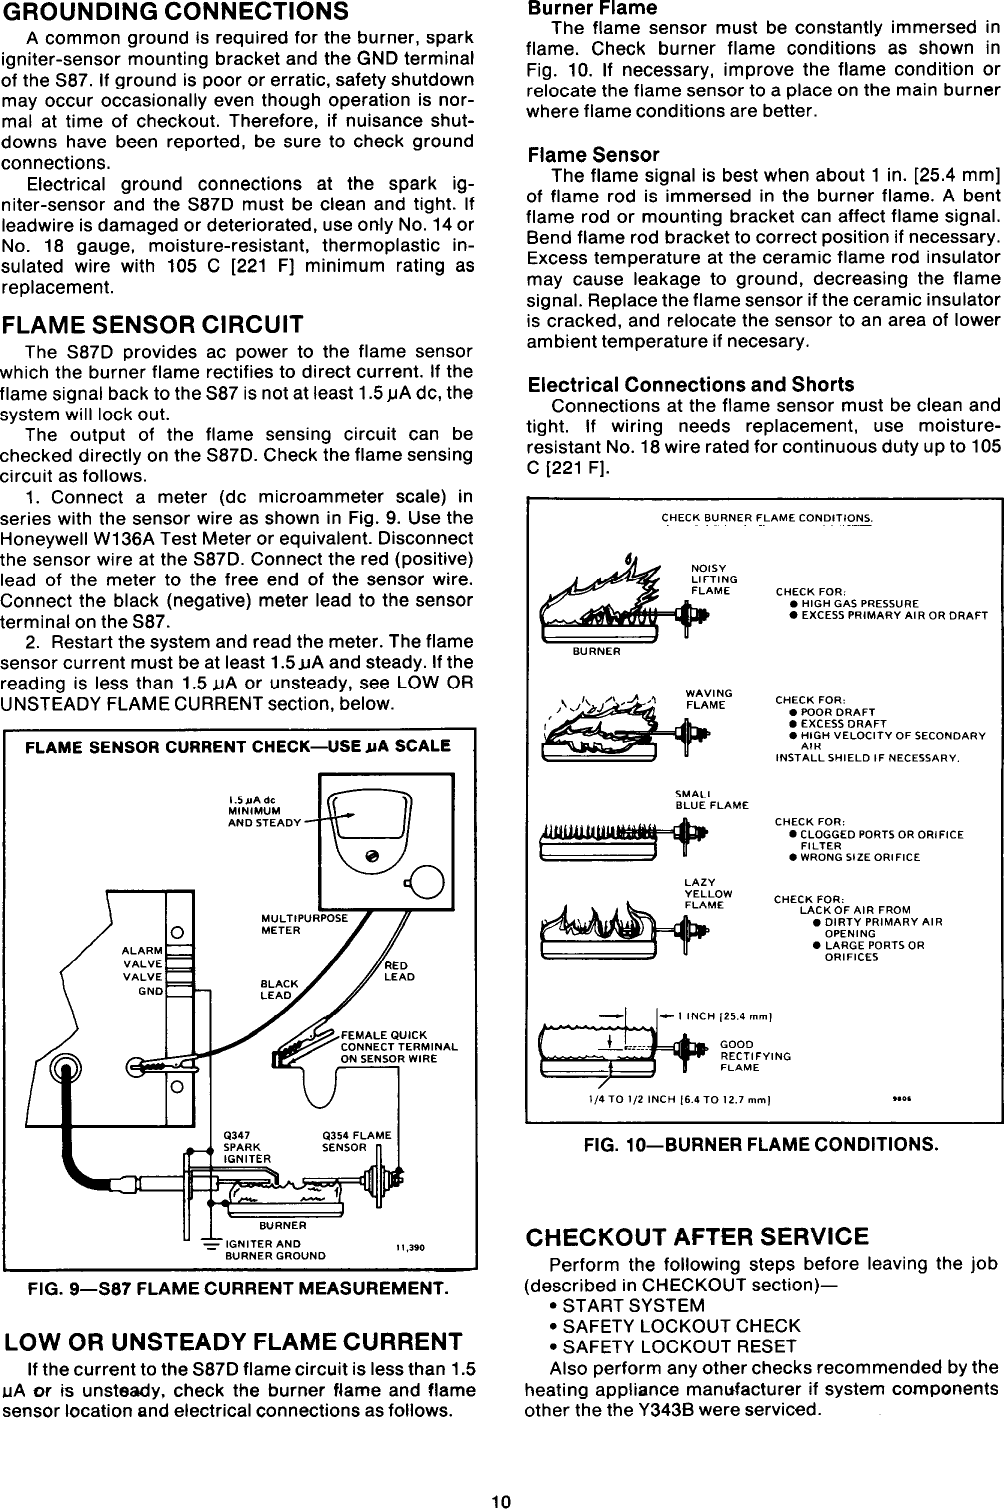 Honeywell Y343B1002 Users Manual 68 0014 Direct Spark Gas